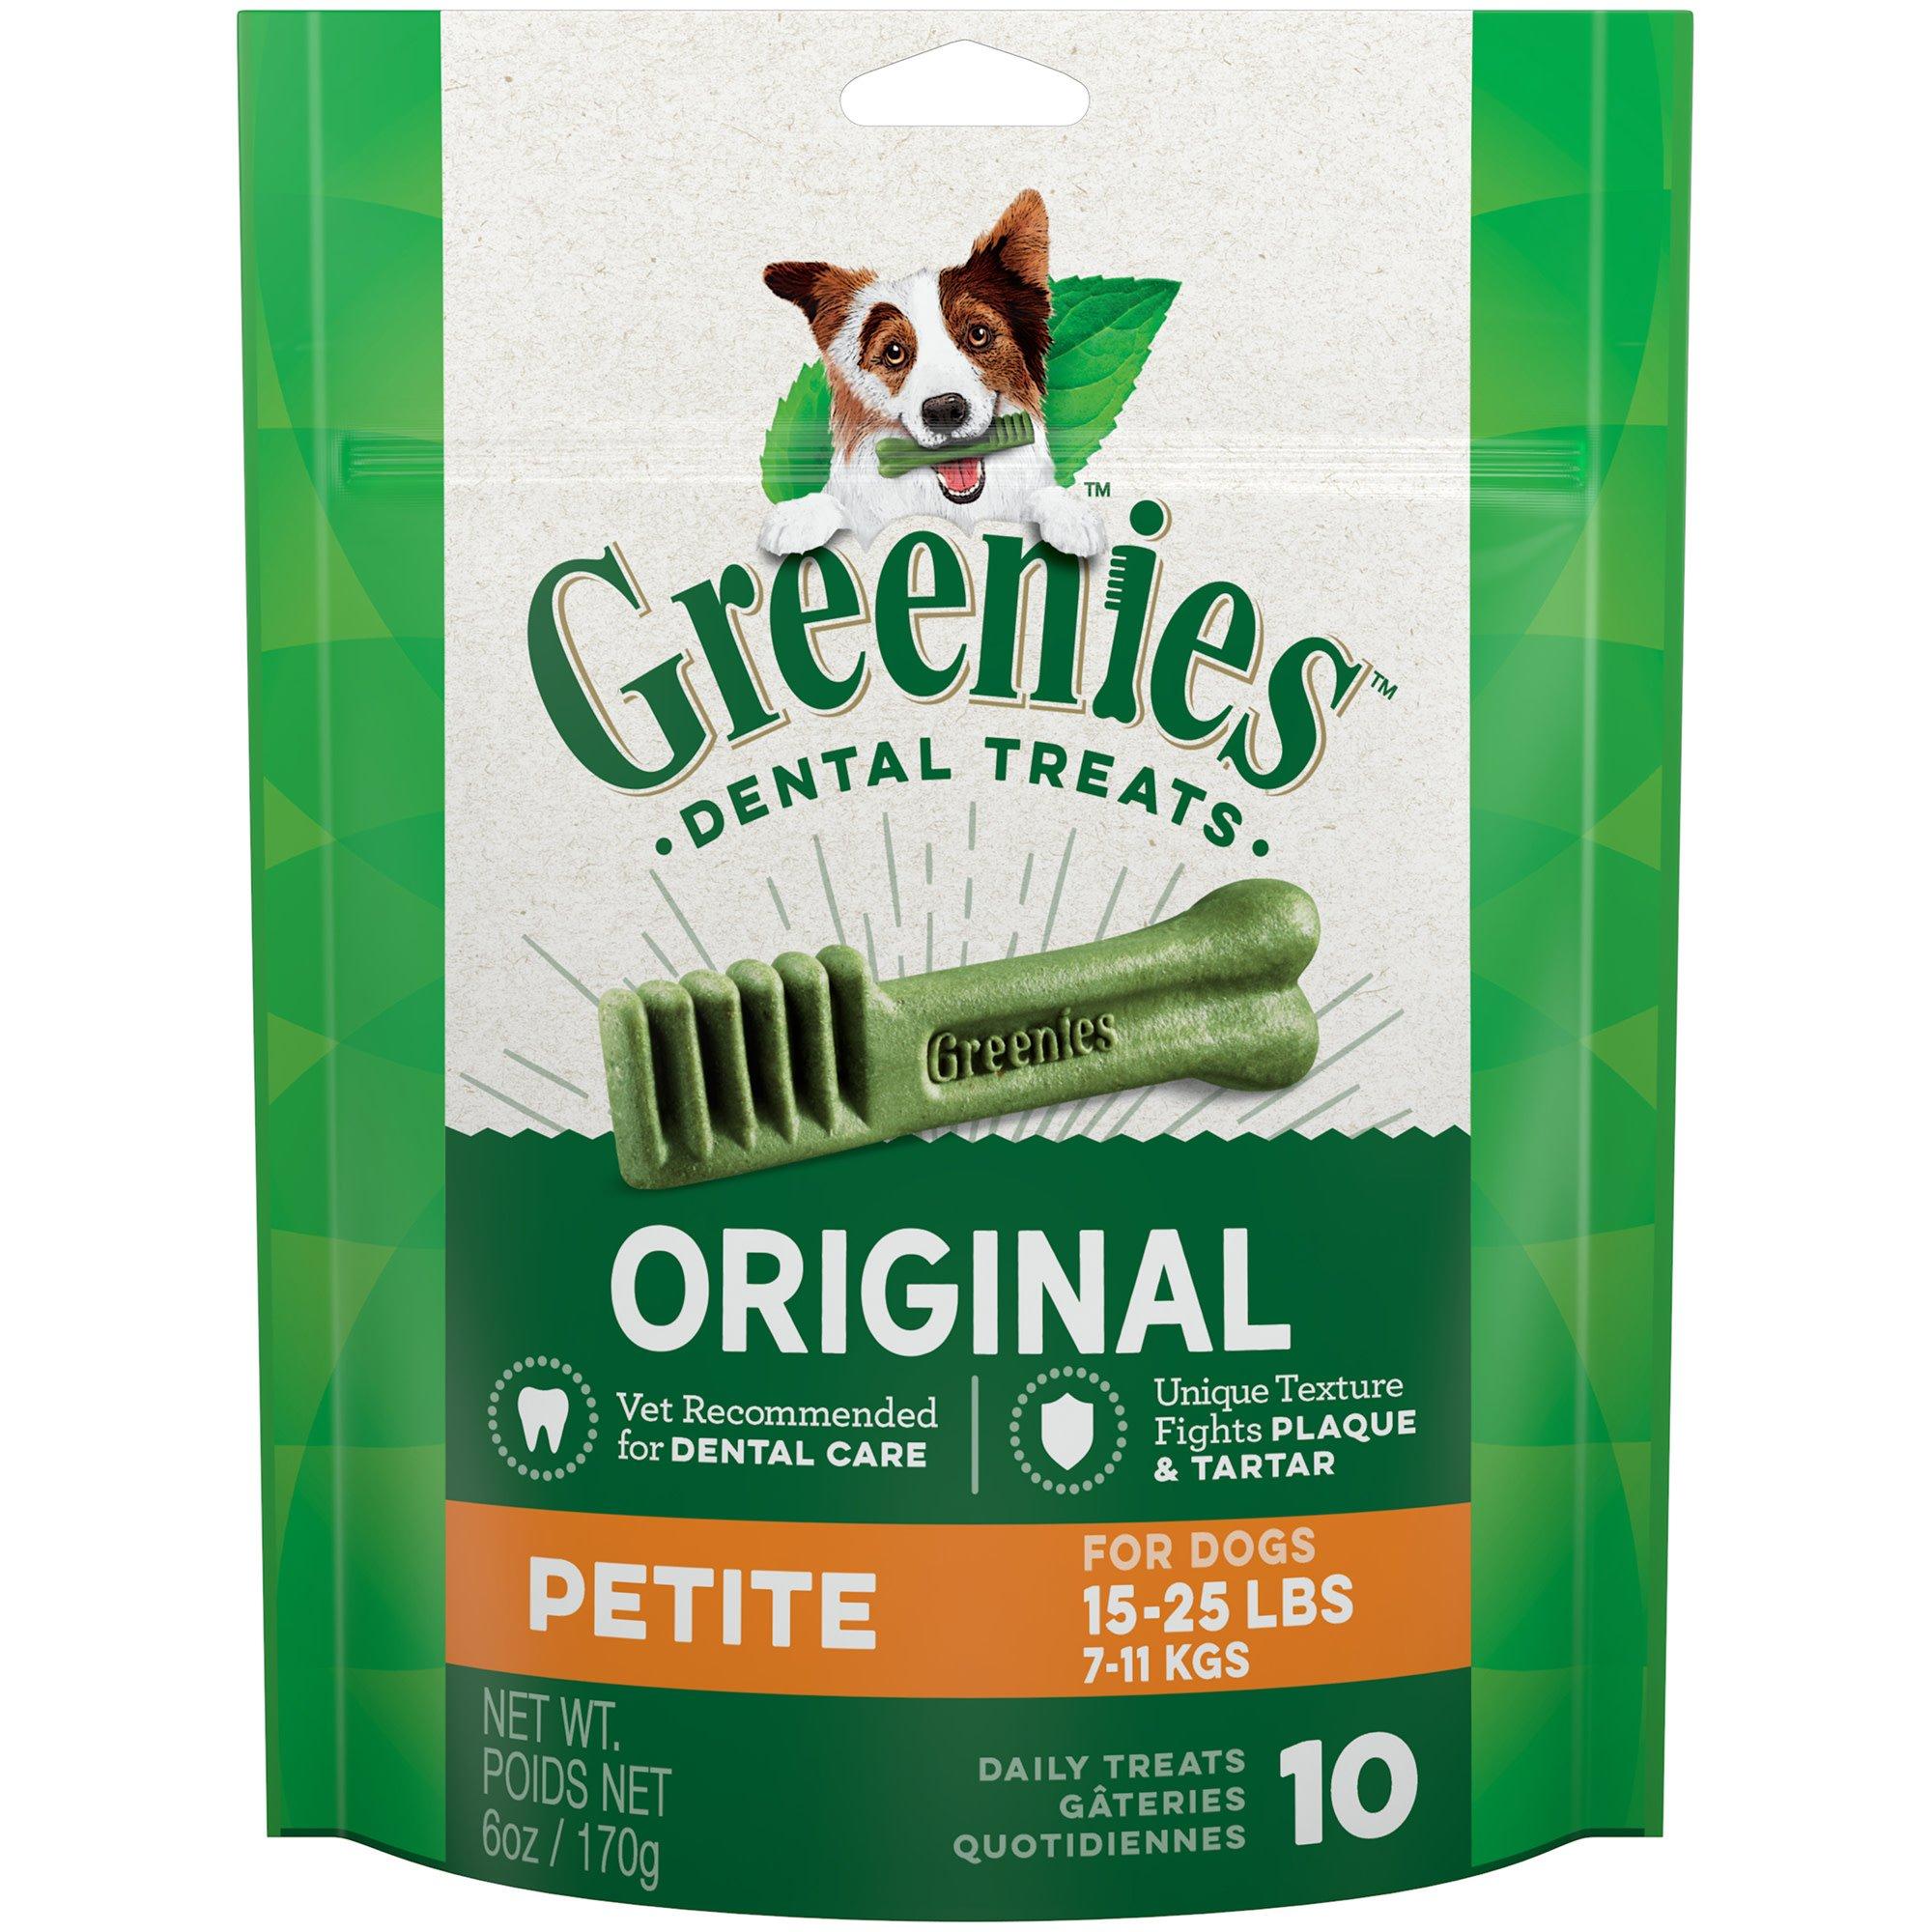 Greenies Original Petite Dental Dog Treats, 10-count